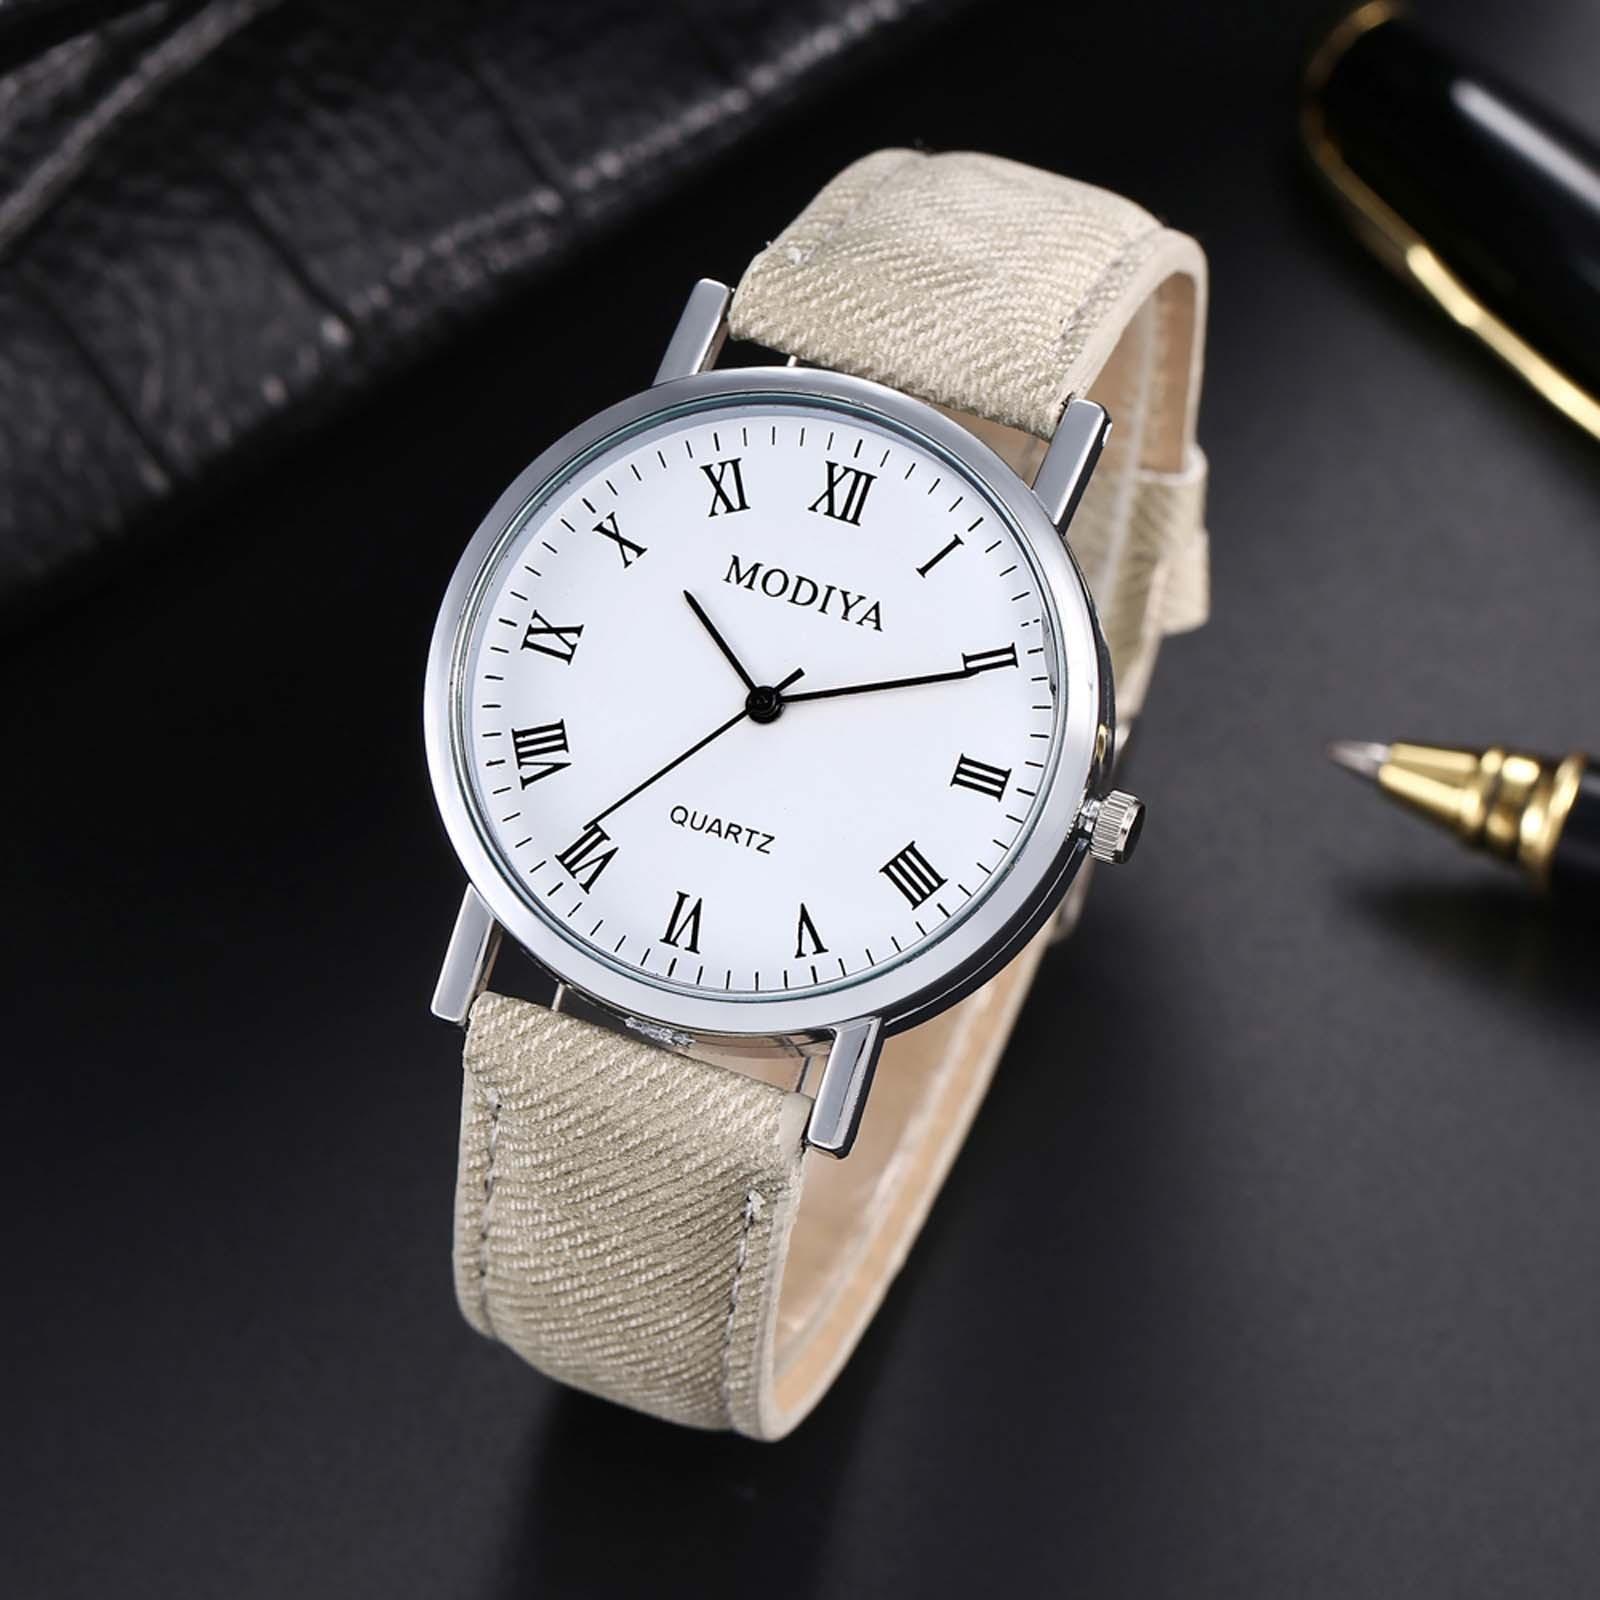 Women Watch Luxury Brand Fashion Leather Strap Sport Quartz Clocks Wrist Analog Watch Gift Ladies ч